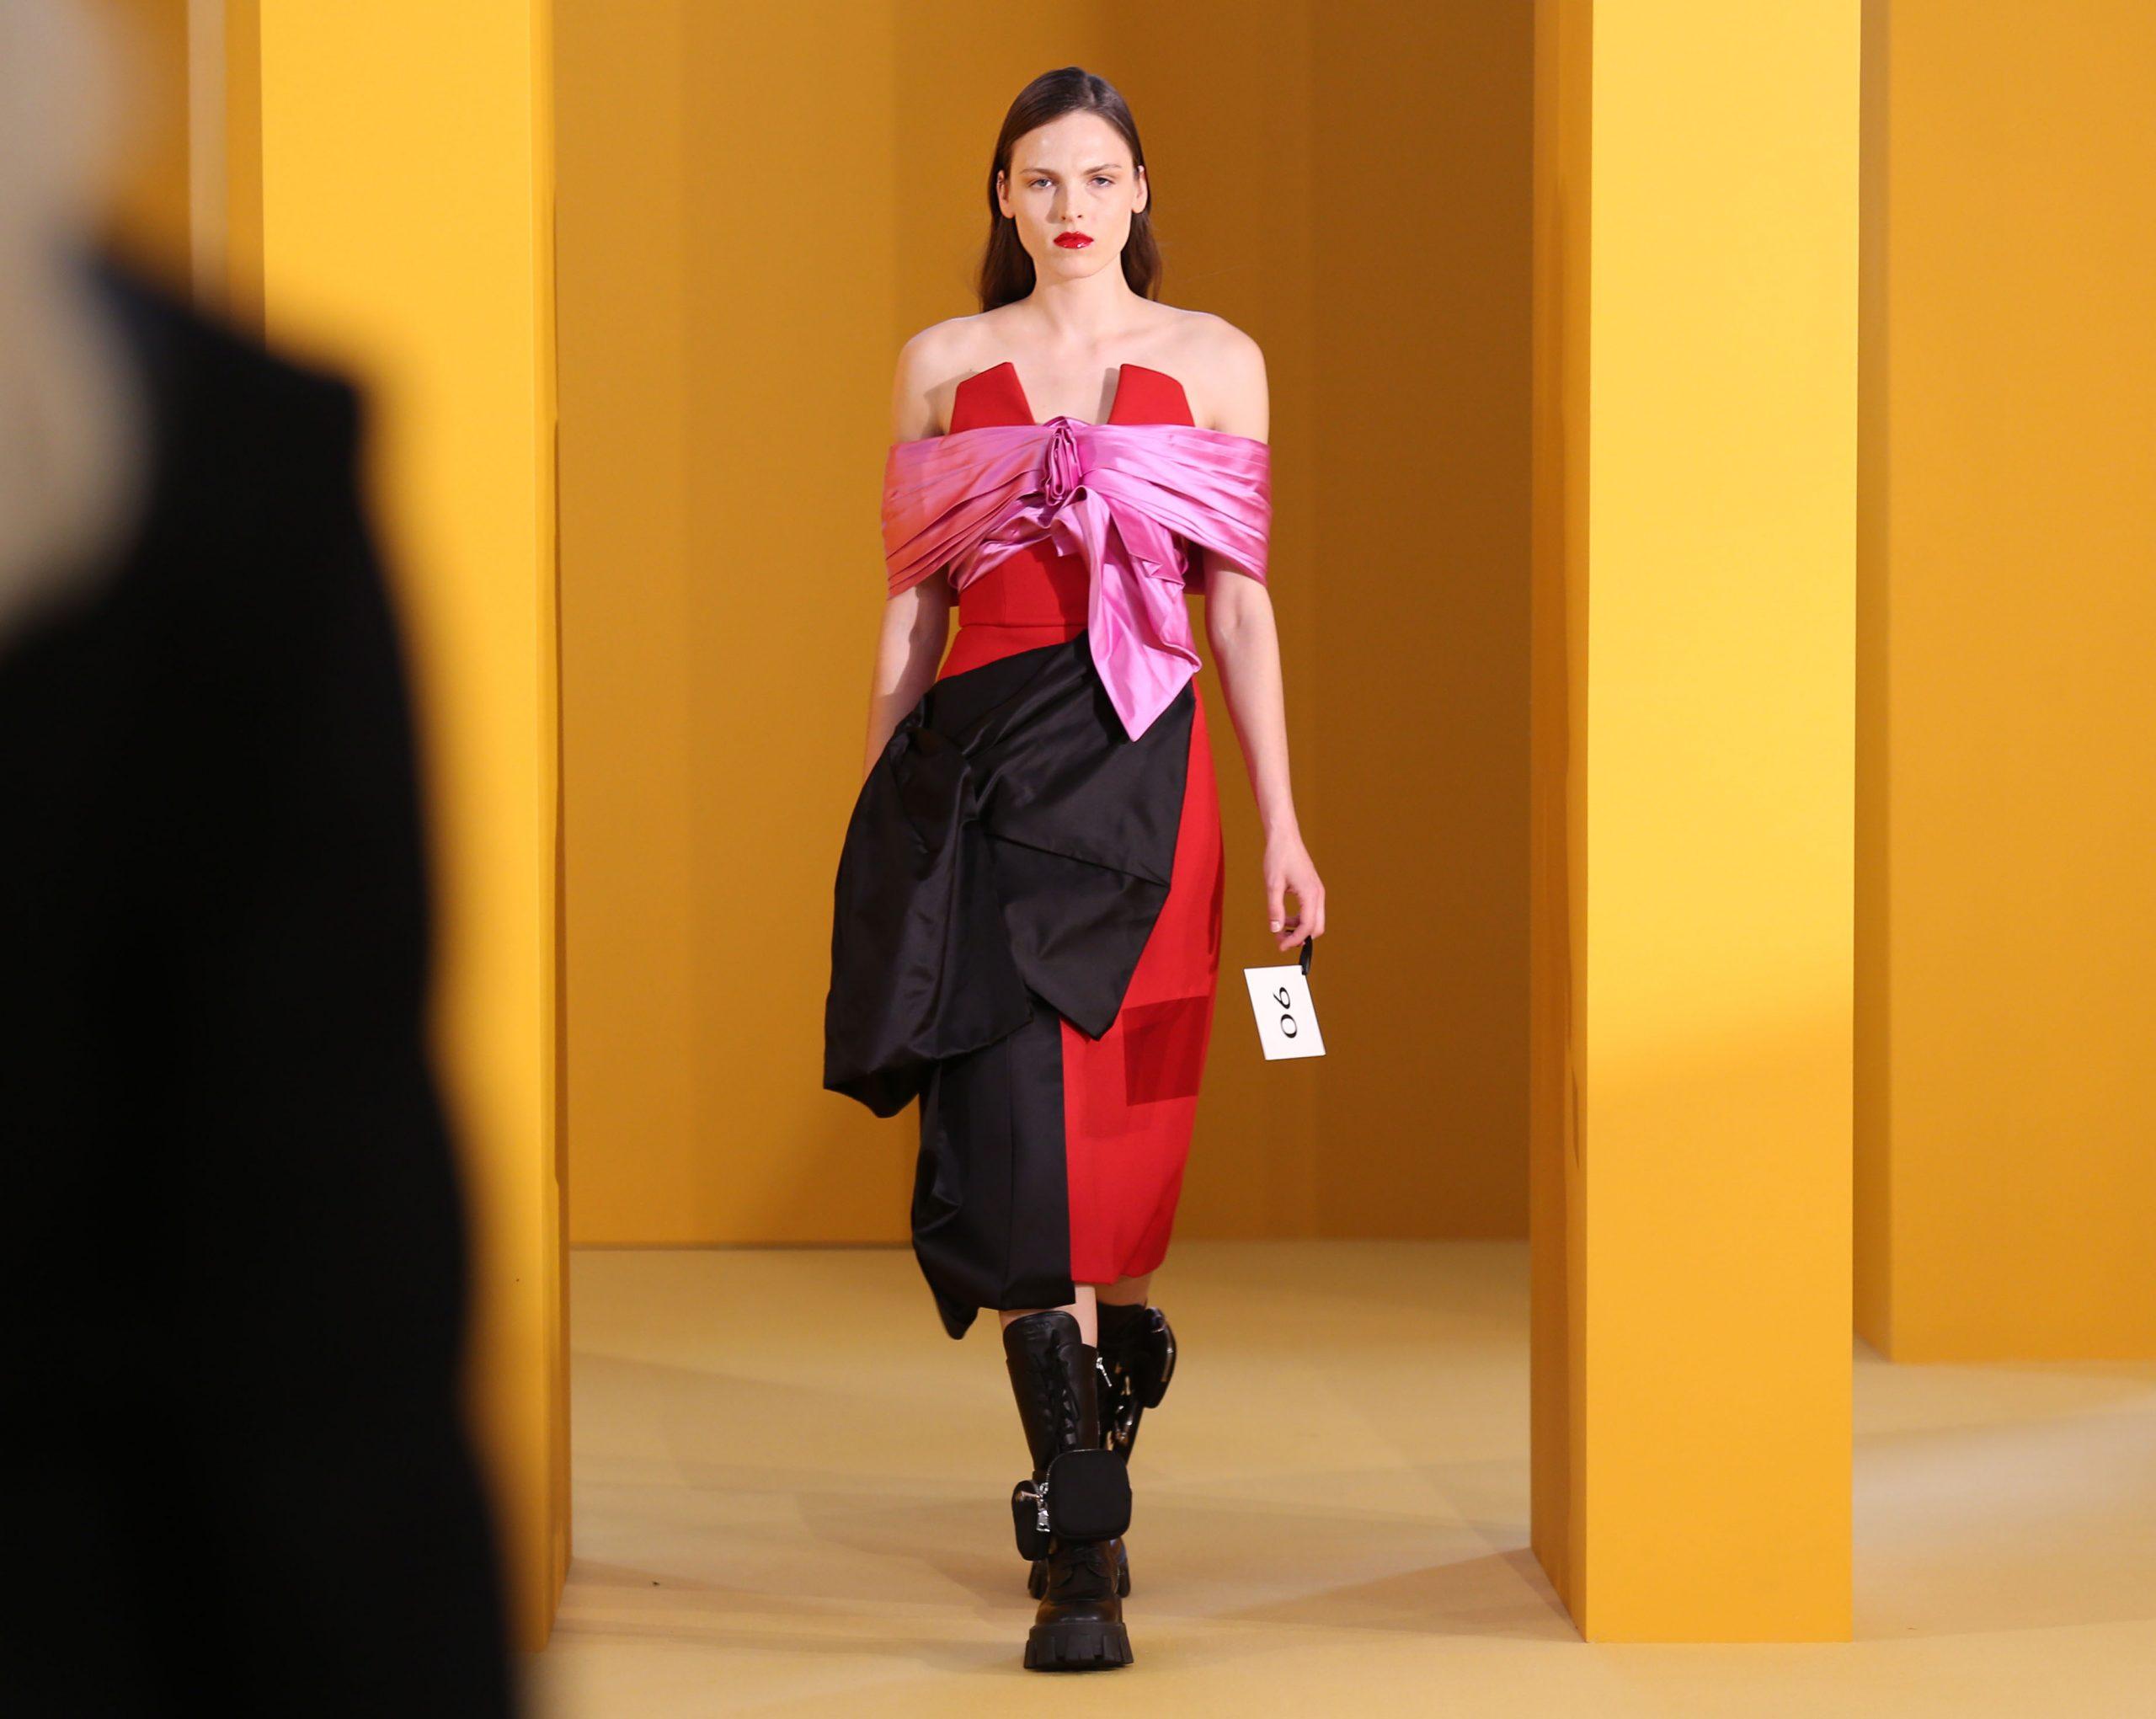 fashion show iPad kiosk app